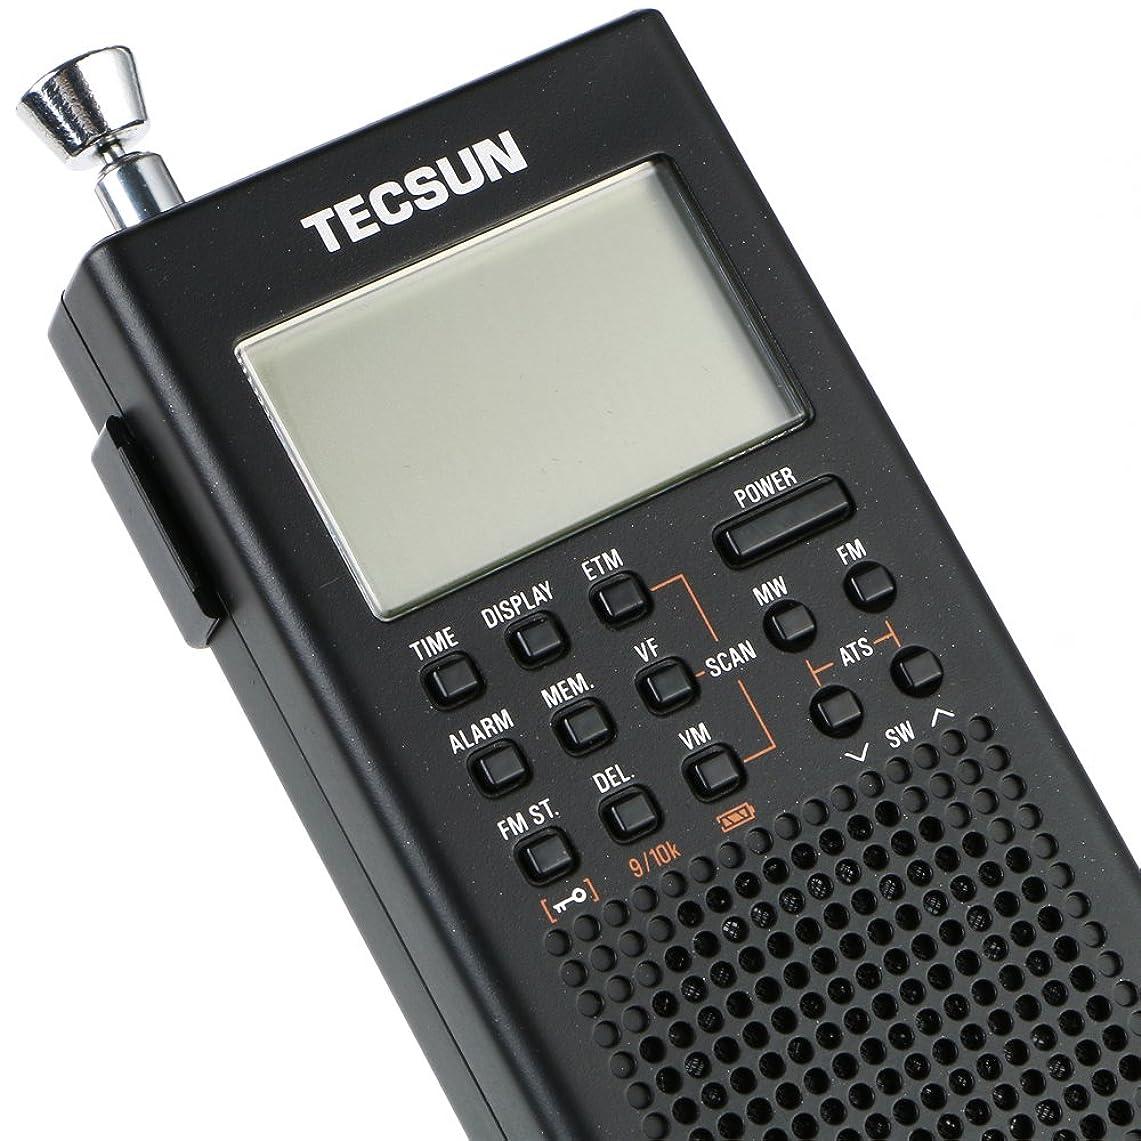 TECSUN 長波、中波ポータブルBCL予め設定された受信機FMステレオ/ LW / MW SWワールドバンド受信機450局メモリ信号メータUSB電源ATSオートプリセットETMスリープタイマの外部とPL-360超小型デジタルDSPポケット短波ラジオアンテナアラーム高品質のスピーカー(シルバー) シルバー